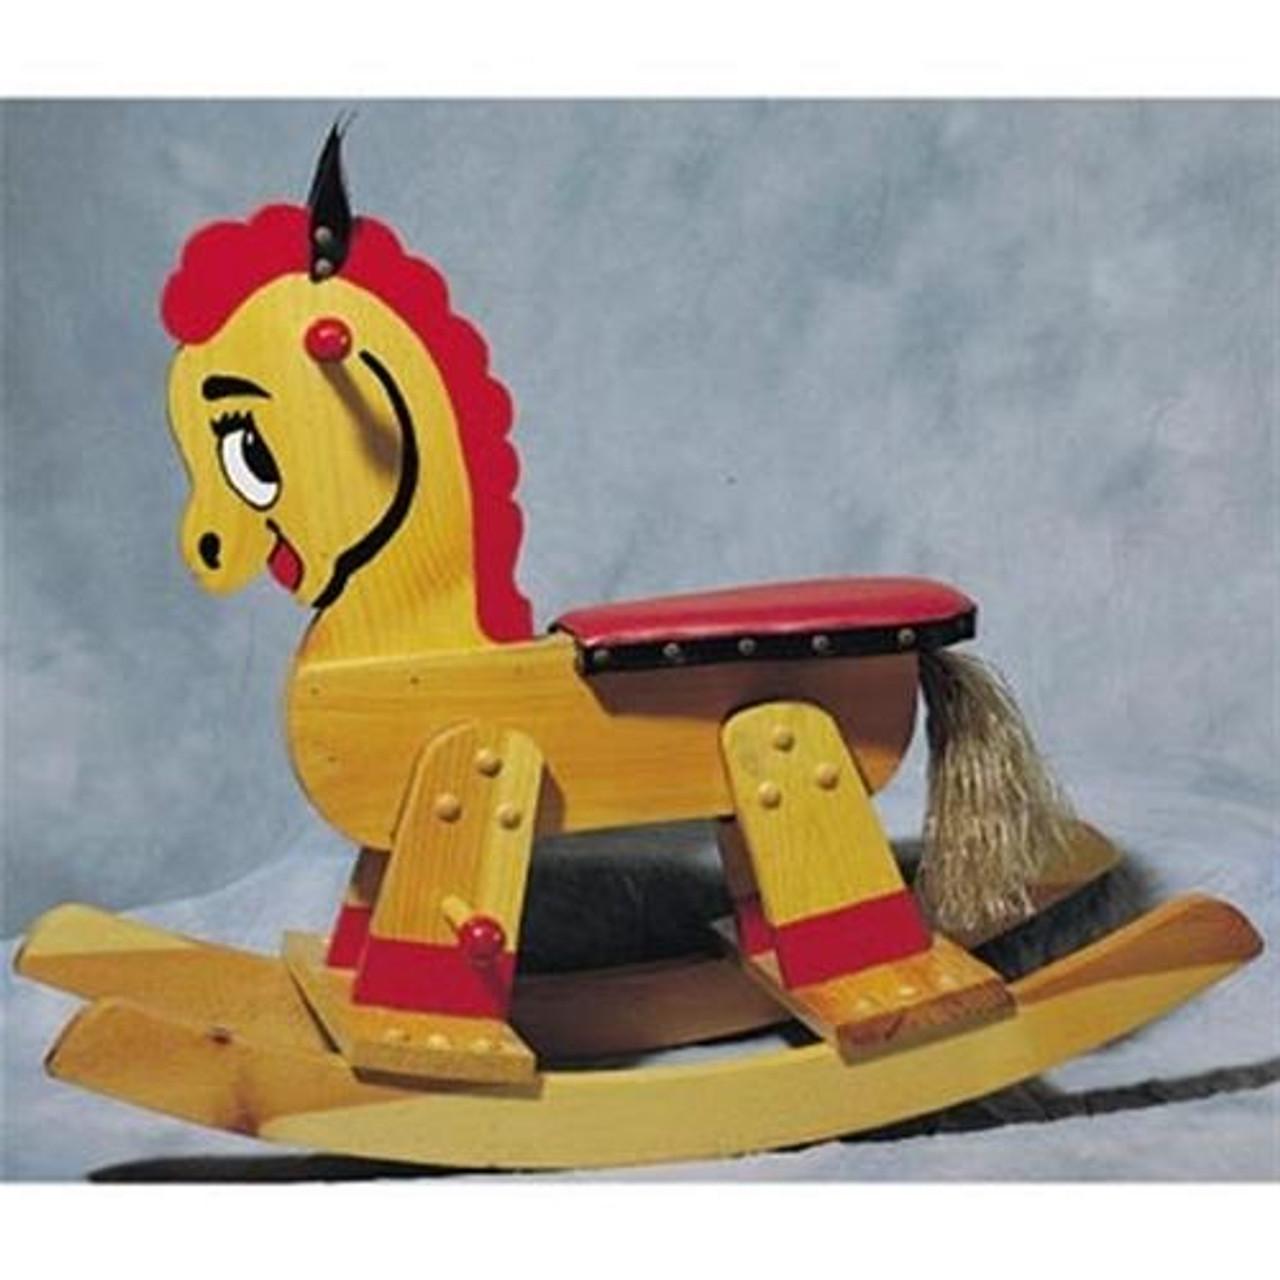 U-Bild Rocking Horse Plan